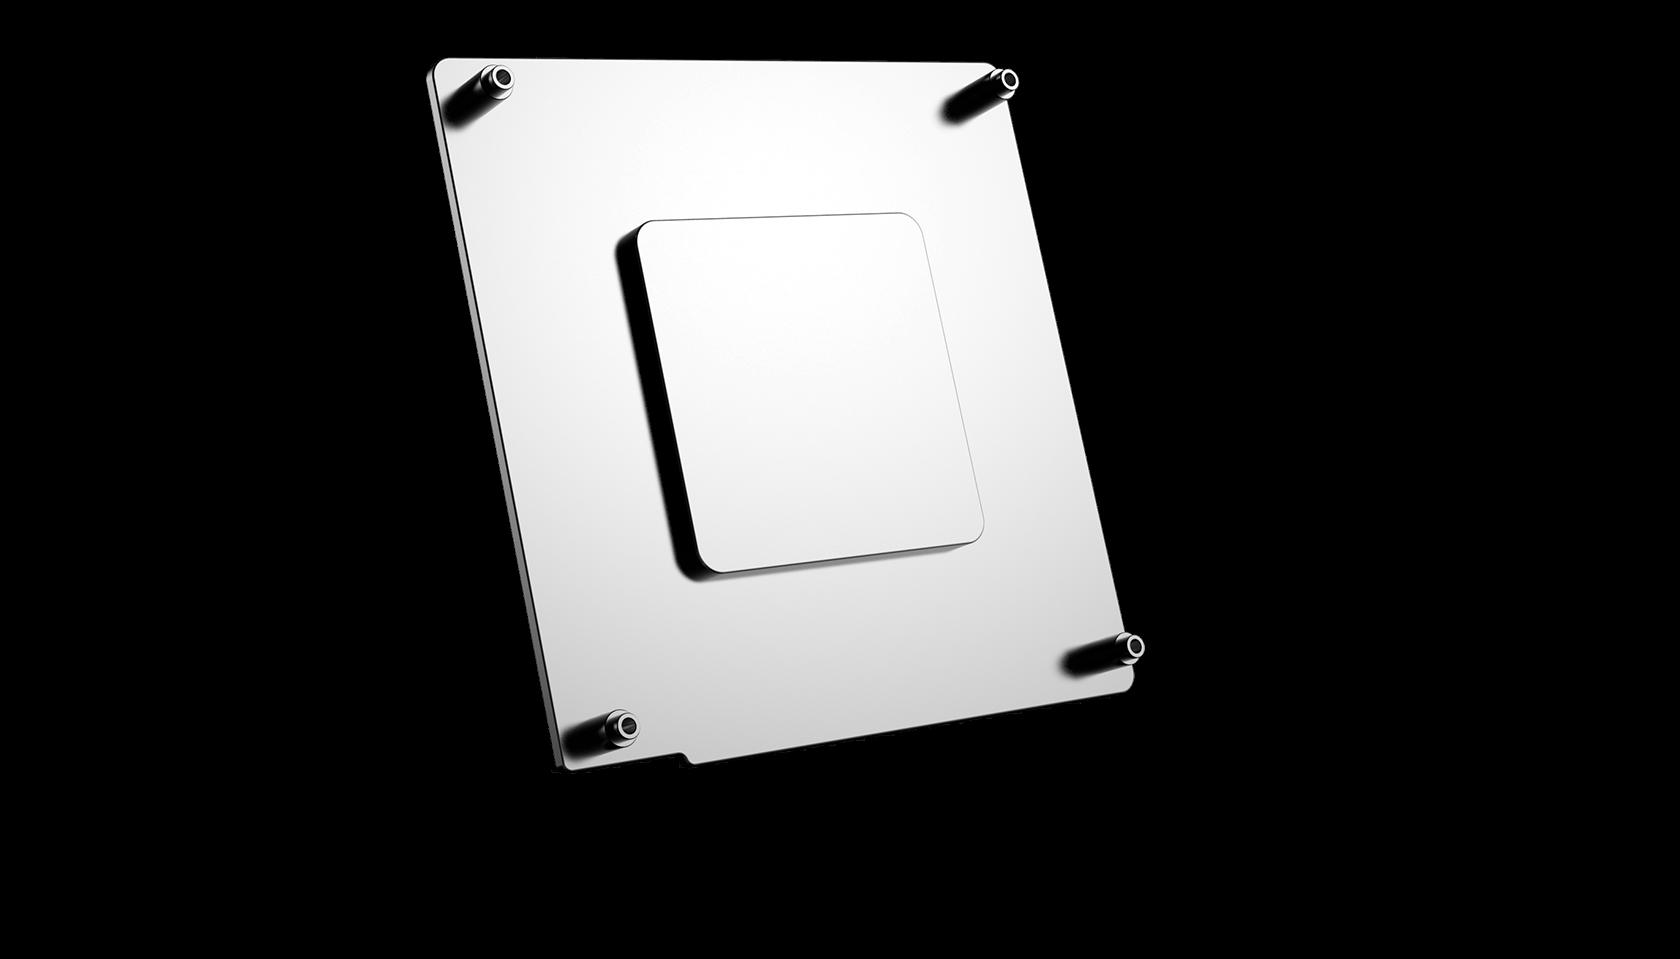 GeForce RTX 2080 Ti VENTUS 11G OC | Graphics card - The world leader